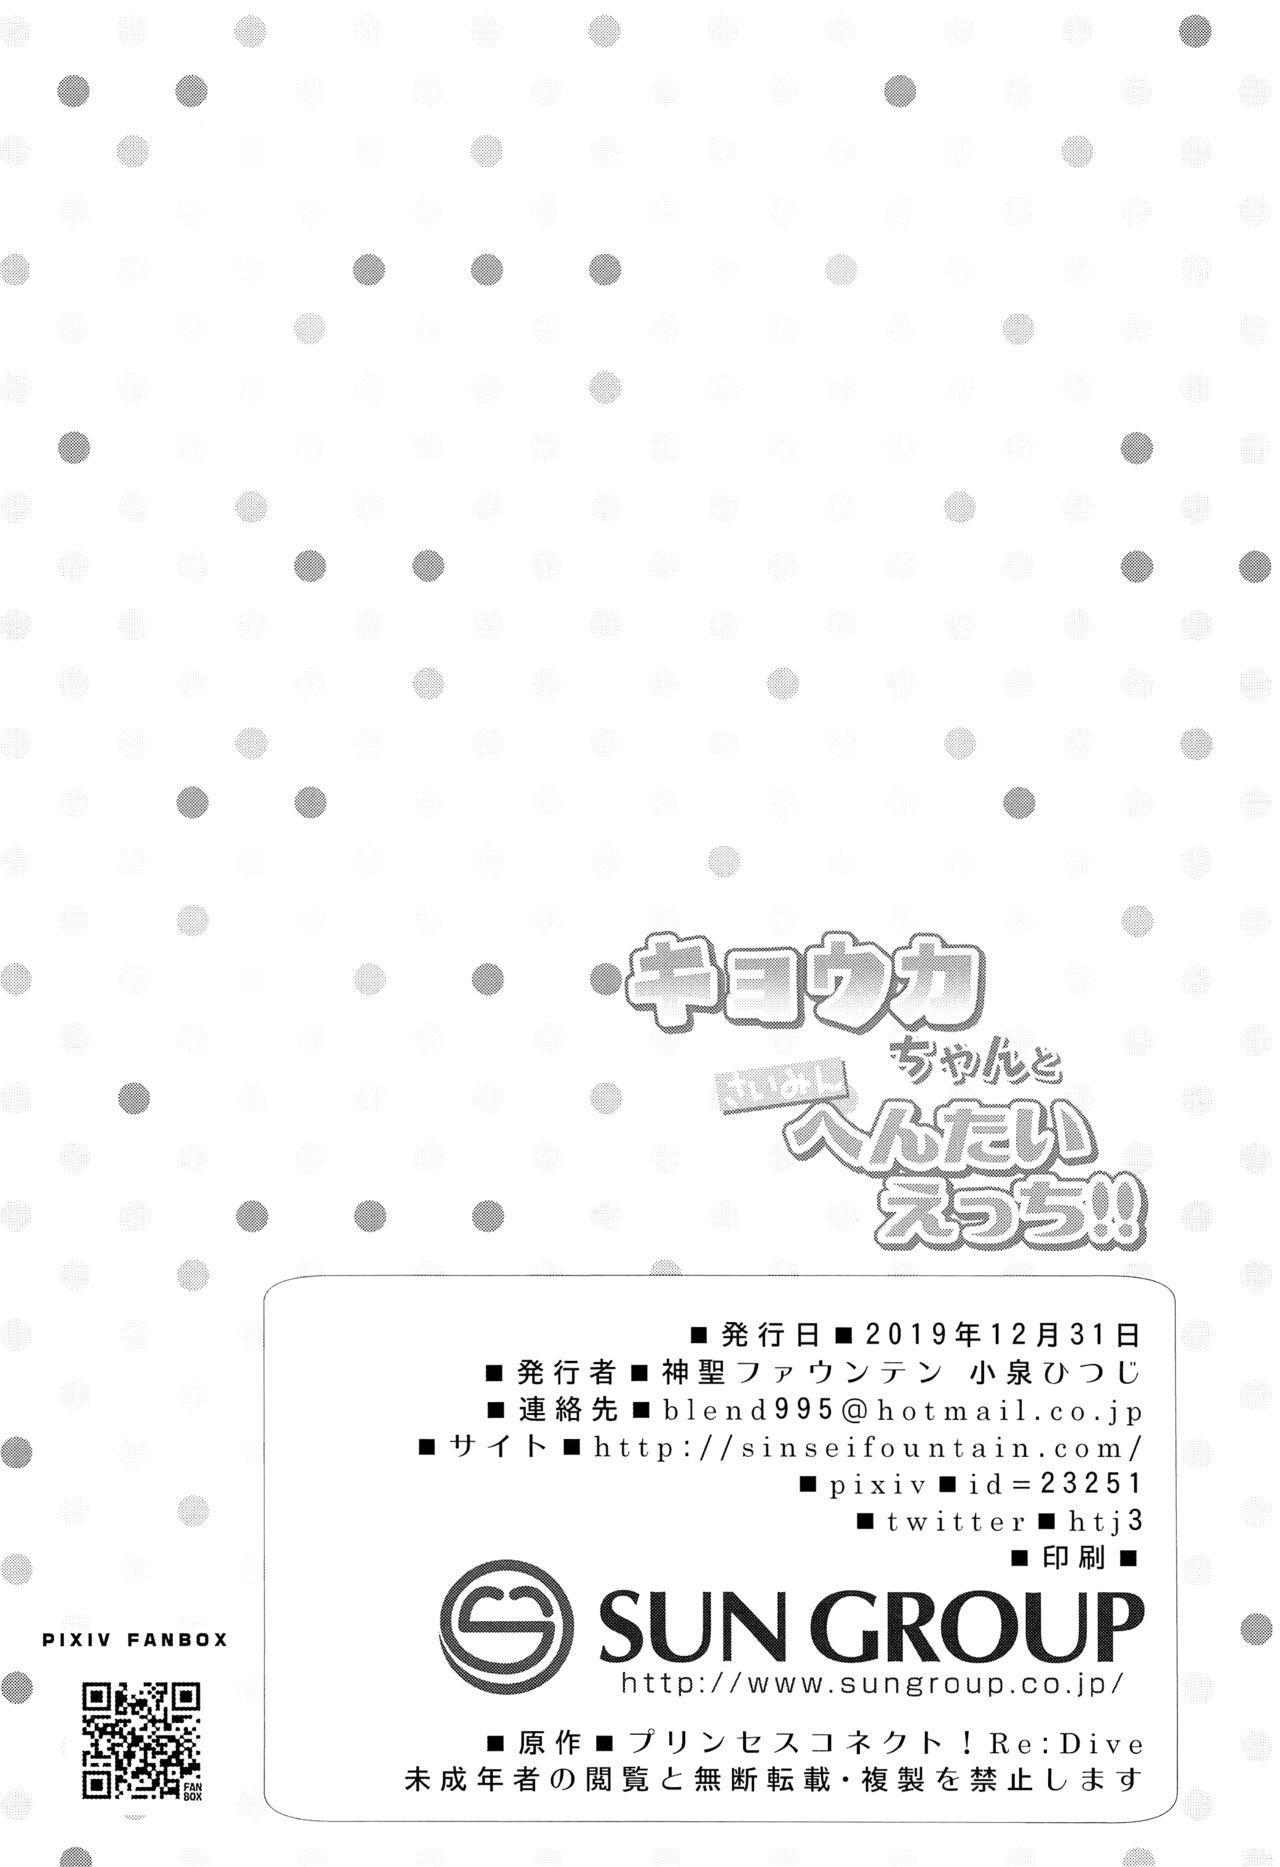 (C97) [Divine Fountain (Koizumi Hitsuji)] Hypnotic Perverted Sex With Kyouka-chan!! | Kyouka-chan to Saimin Hentai Ecchi!! (Princess Connect! Re:Dive) [English] [Melty Scans] 24